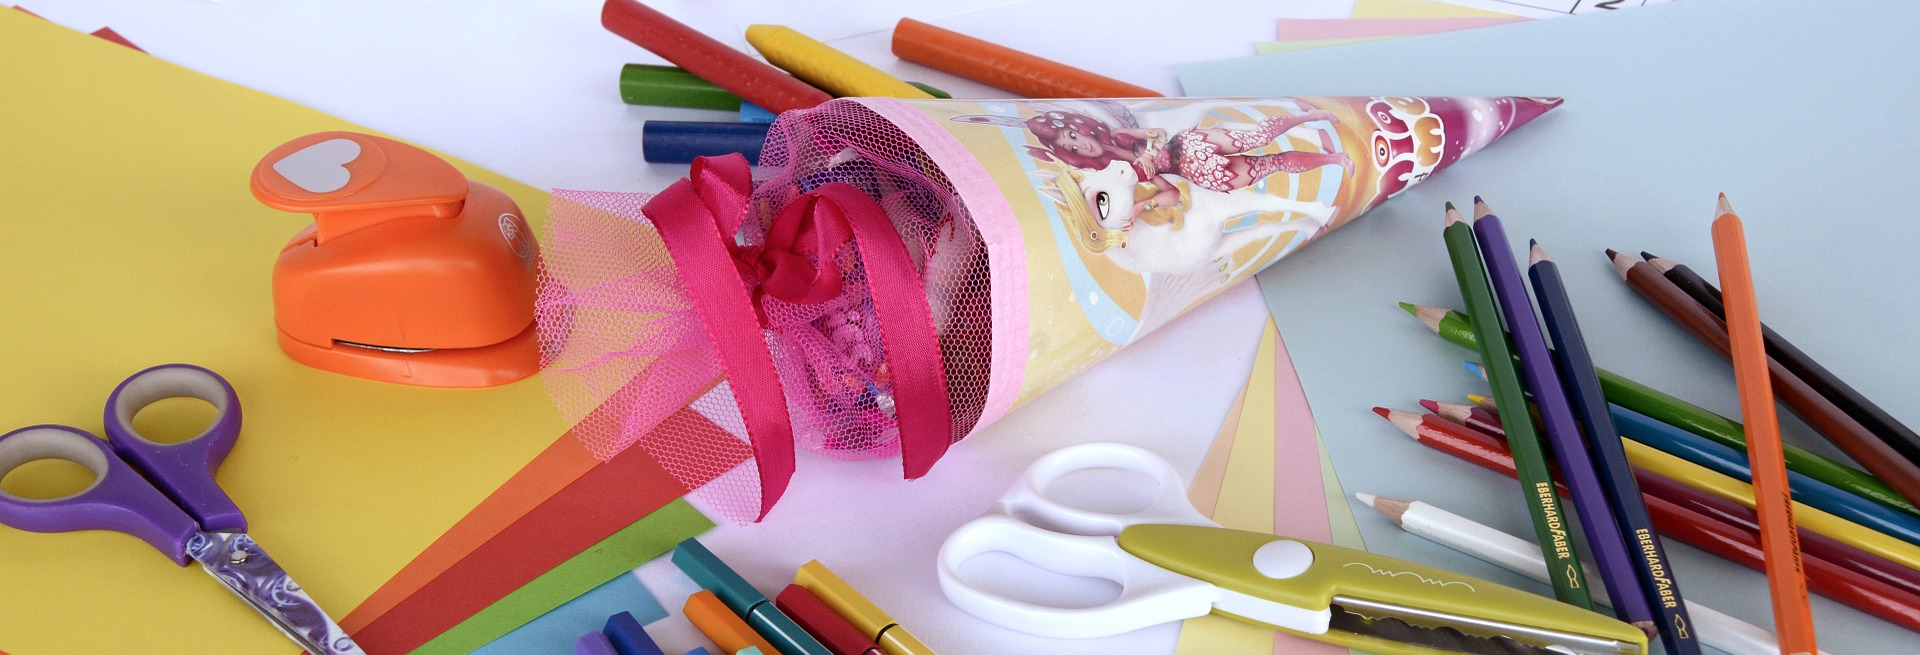 DIY - Selbstgemachter Klebstoff für Kinder